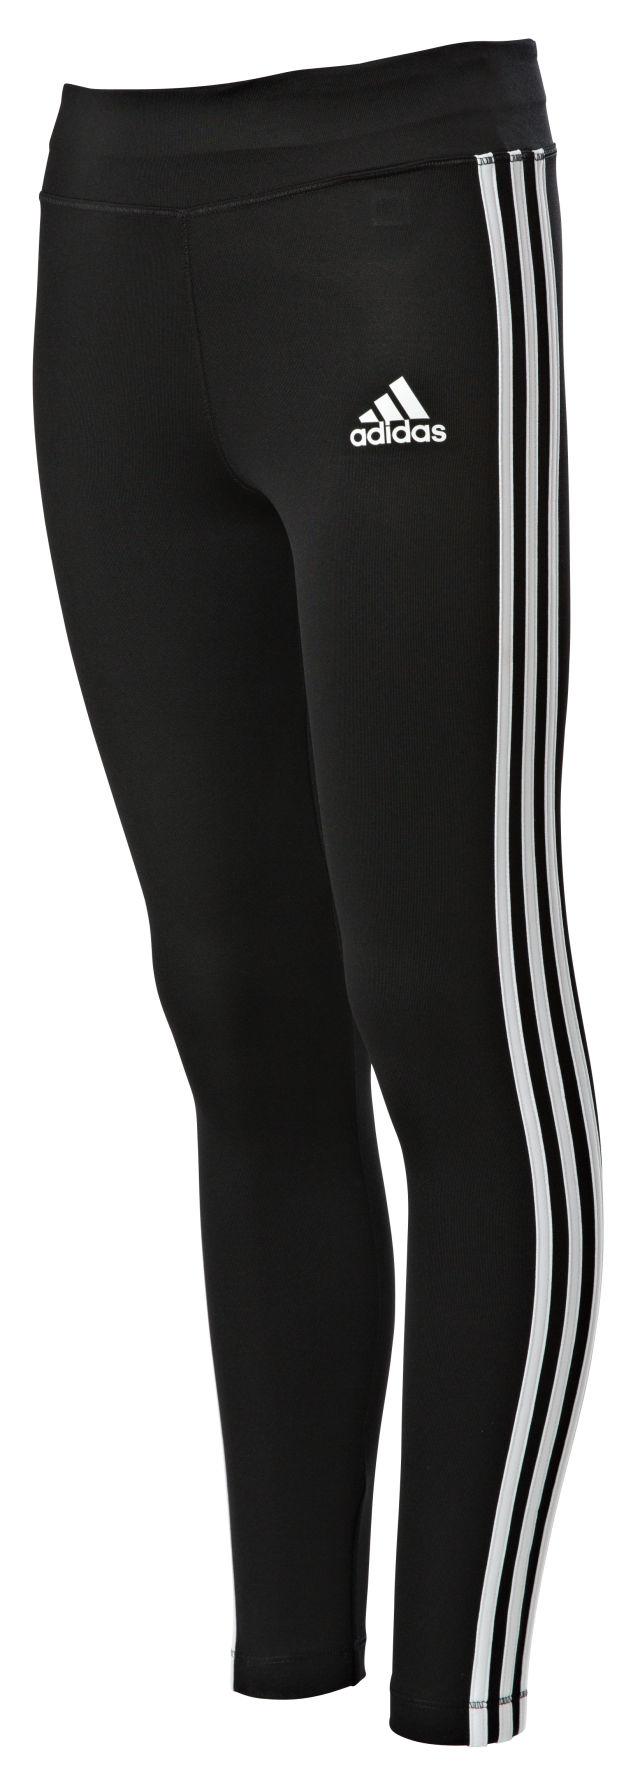 Liikuttavan halpa. Adidas. Girls Gear Up 3 Stripes Tight tyttöjen trikoot.  26. 95 · Liikuttavan halpa. Adidas. Yg Linear tyttöjen trikoot 050a8a15c8